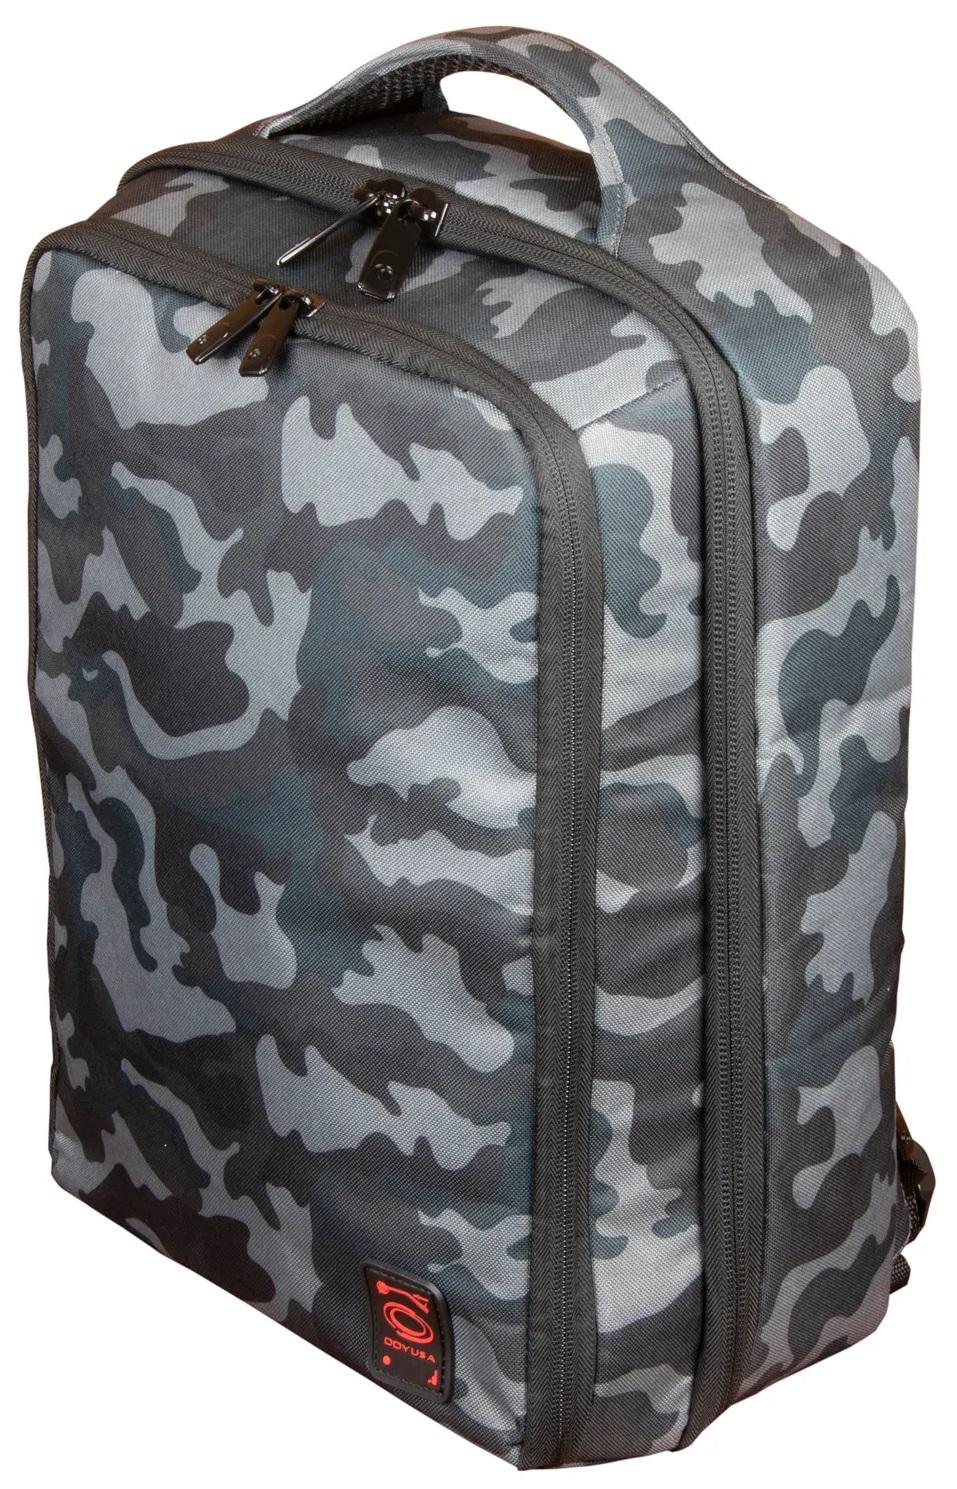 odyssey-gray-camouflage-compact-premium-dj-backpack-brxmk2bp10gyc.jpeg